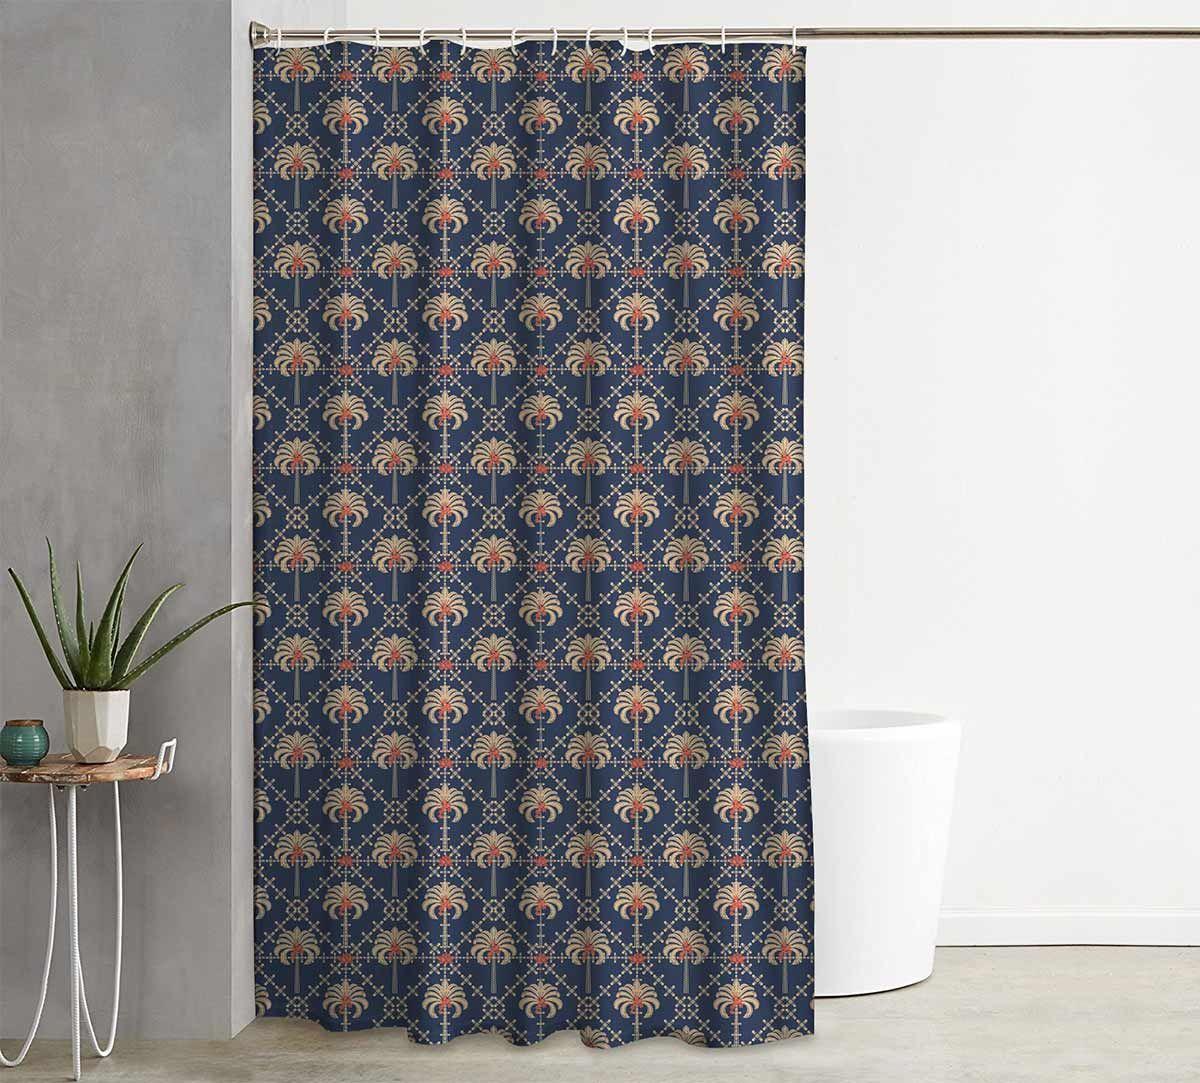 Buy designer shower curtains online   indiacircus.com